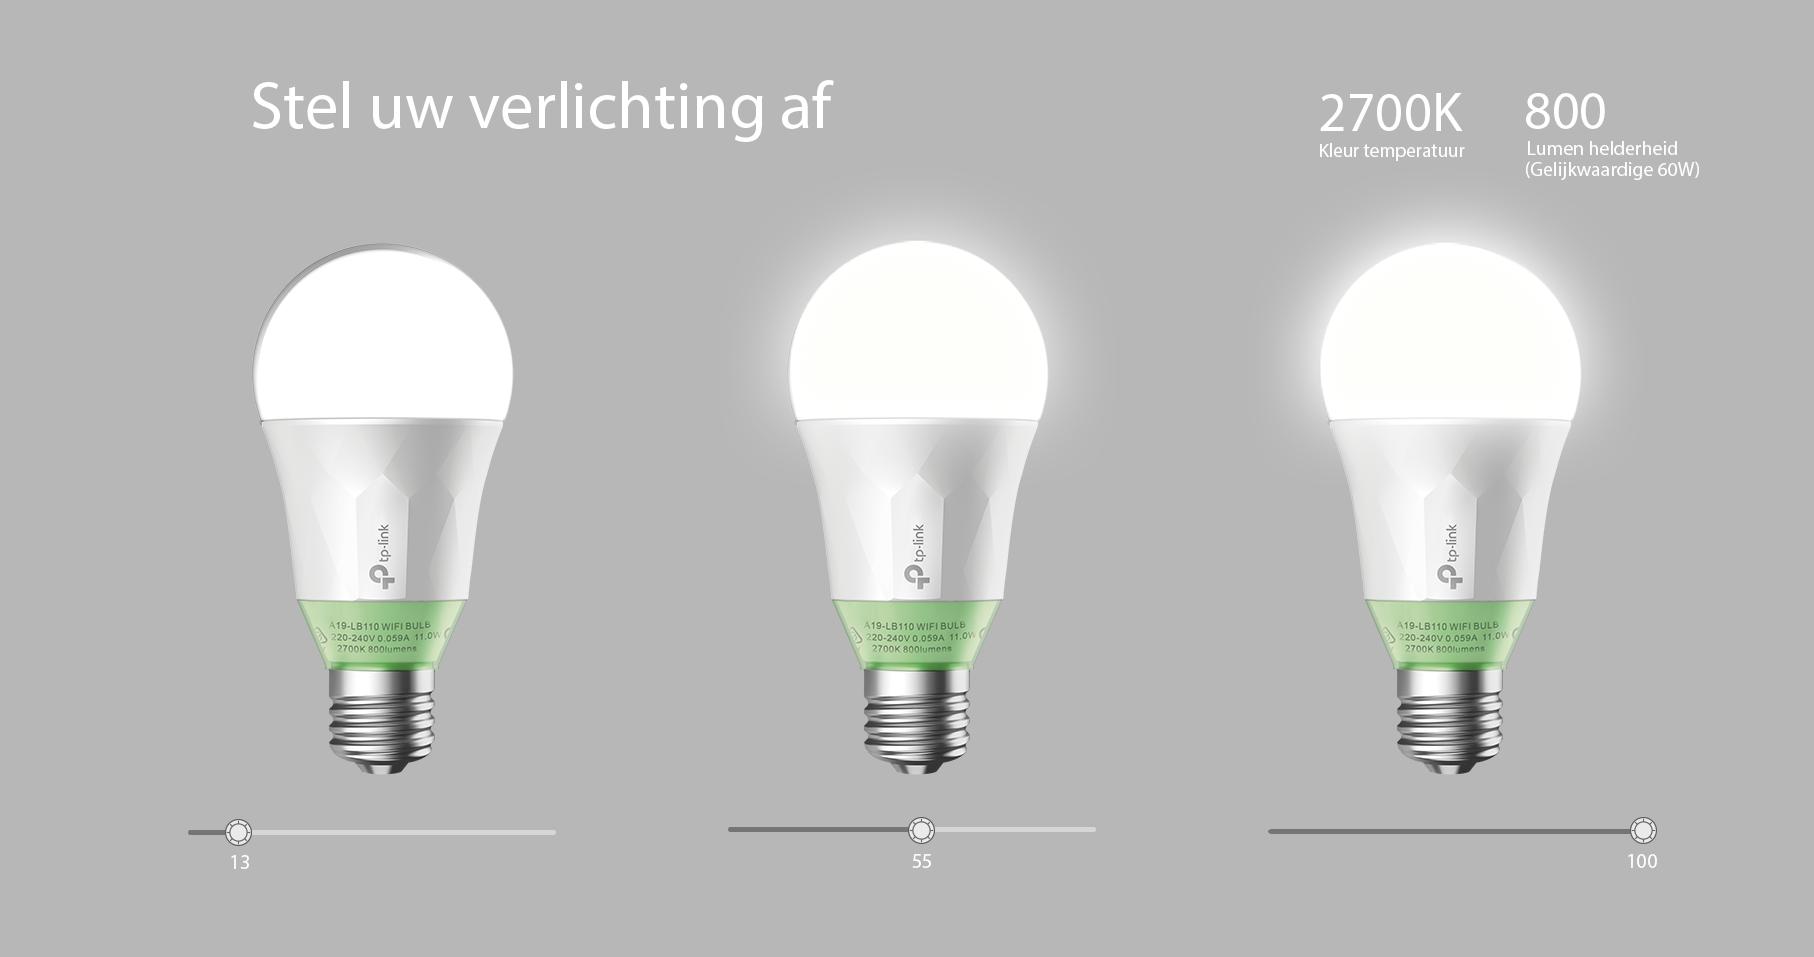 Bol tp link lb110 wifi smart bulb bespaar energie met led lampen parisarafo Image collections